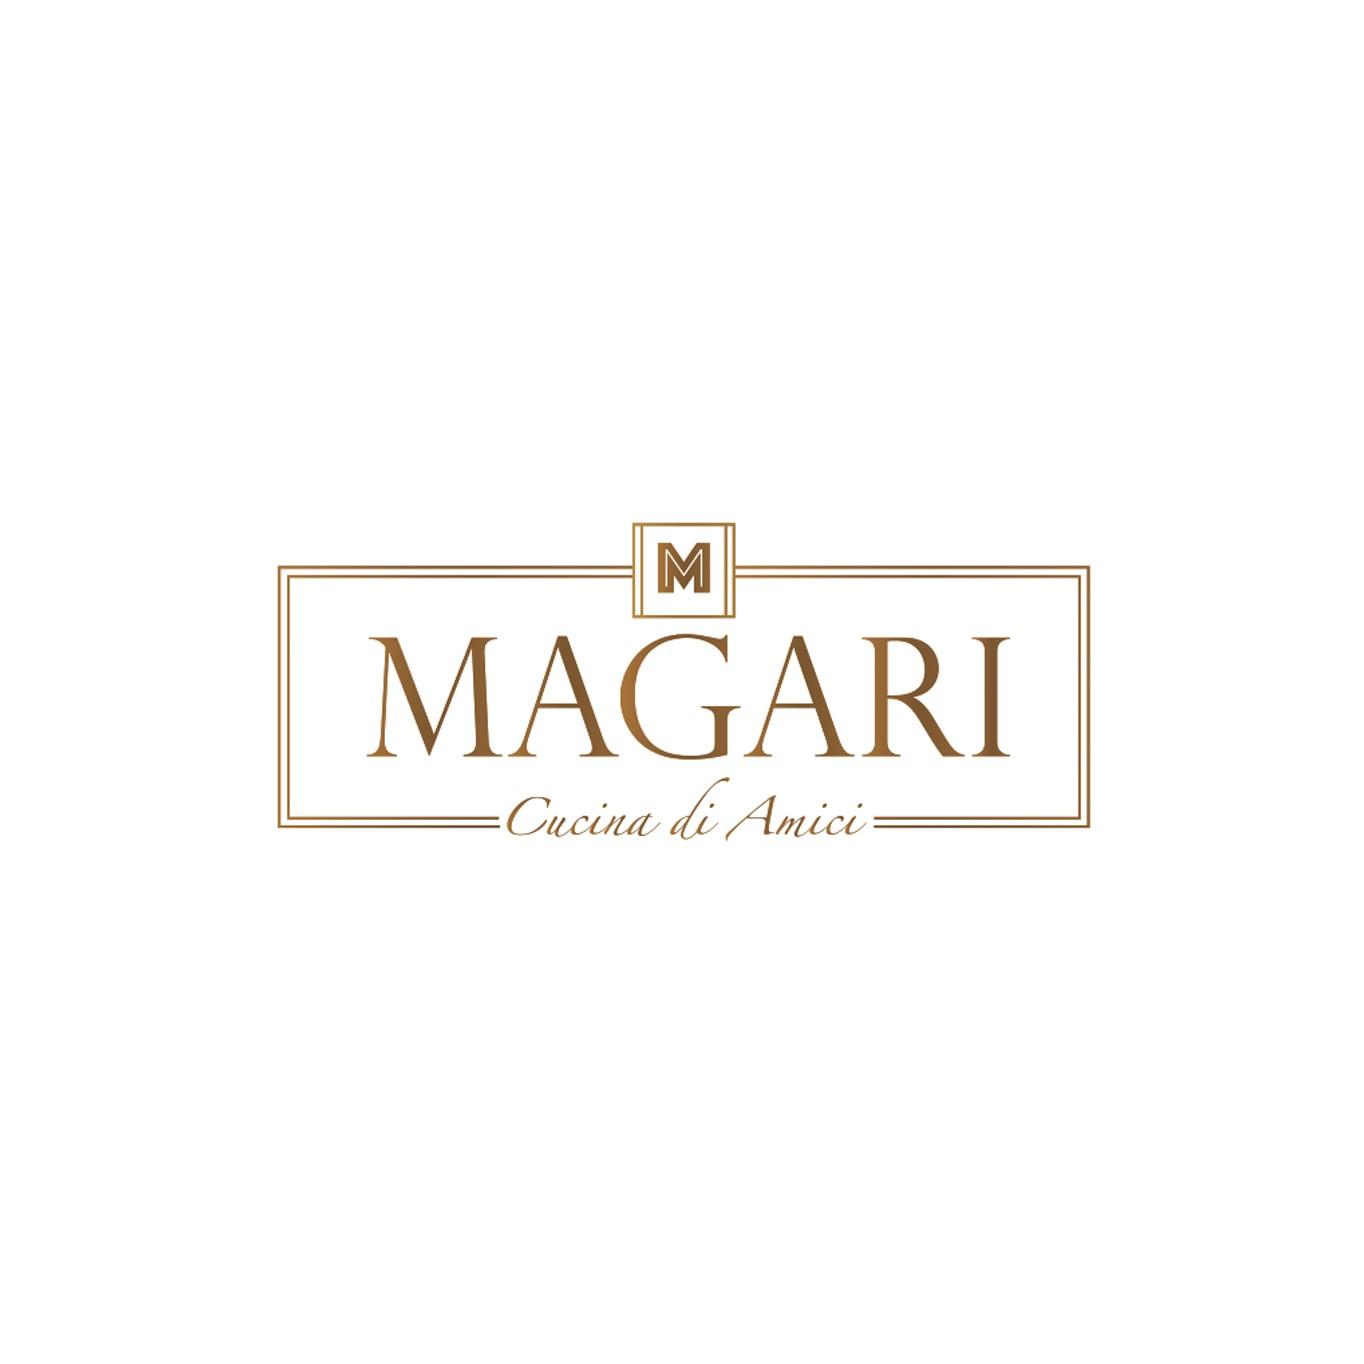 https://statusviagens.com/wp-content/uploads/2020/09/parceiros_magari.jpg